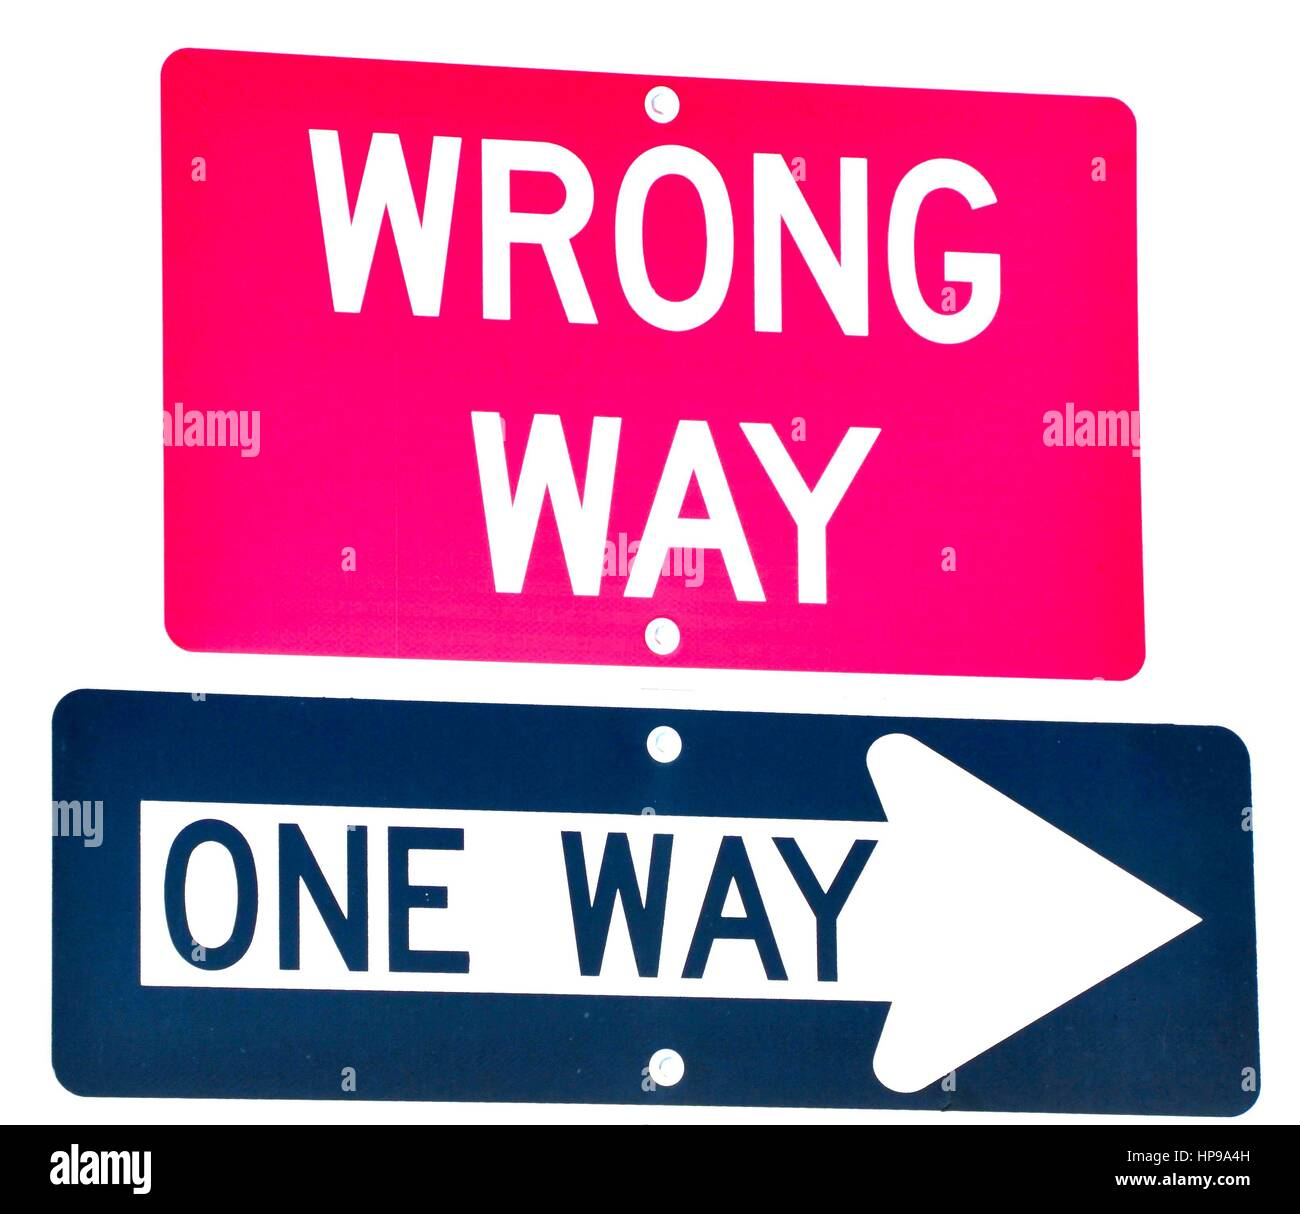 wrong way one way street sign stock photo 134200545 alamy